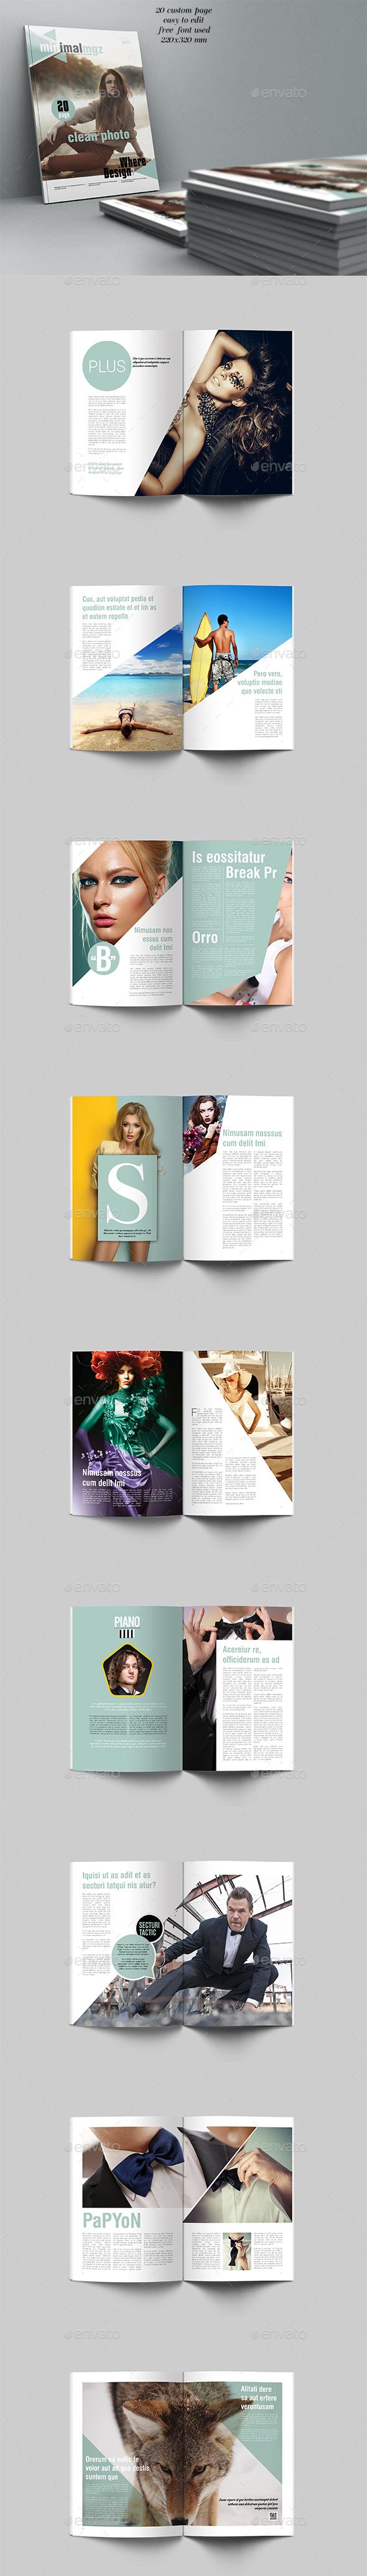 Minimal Mgz Template 20 Page - Magazines Print Templates